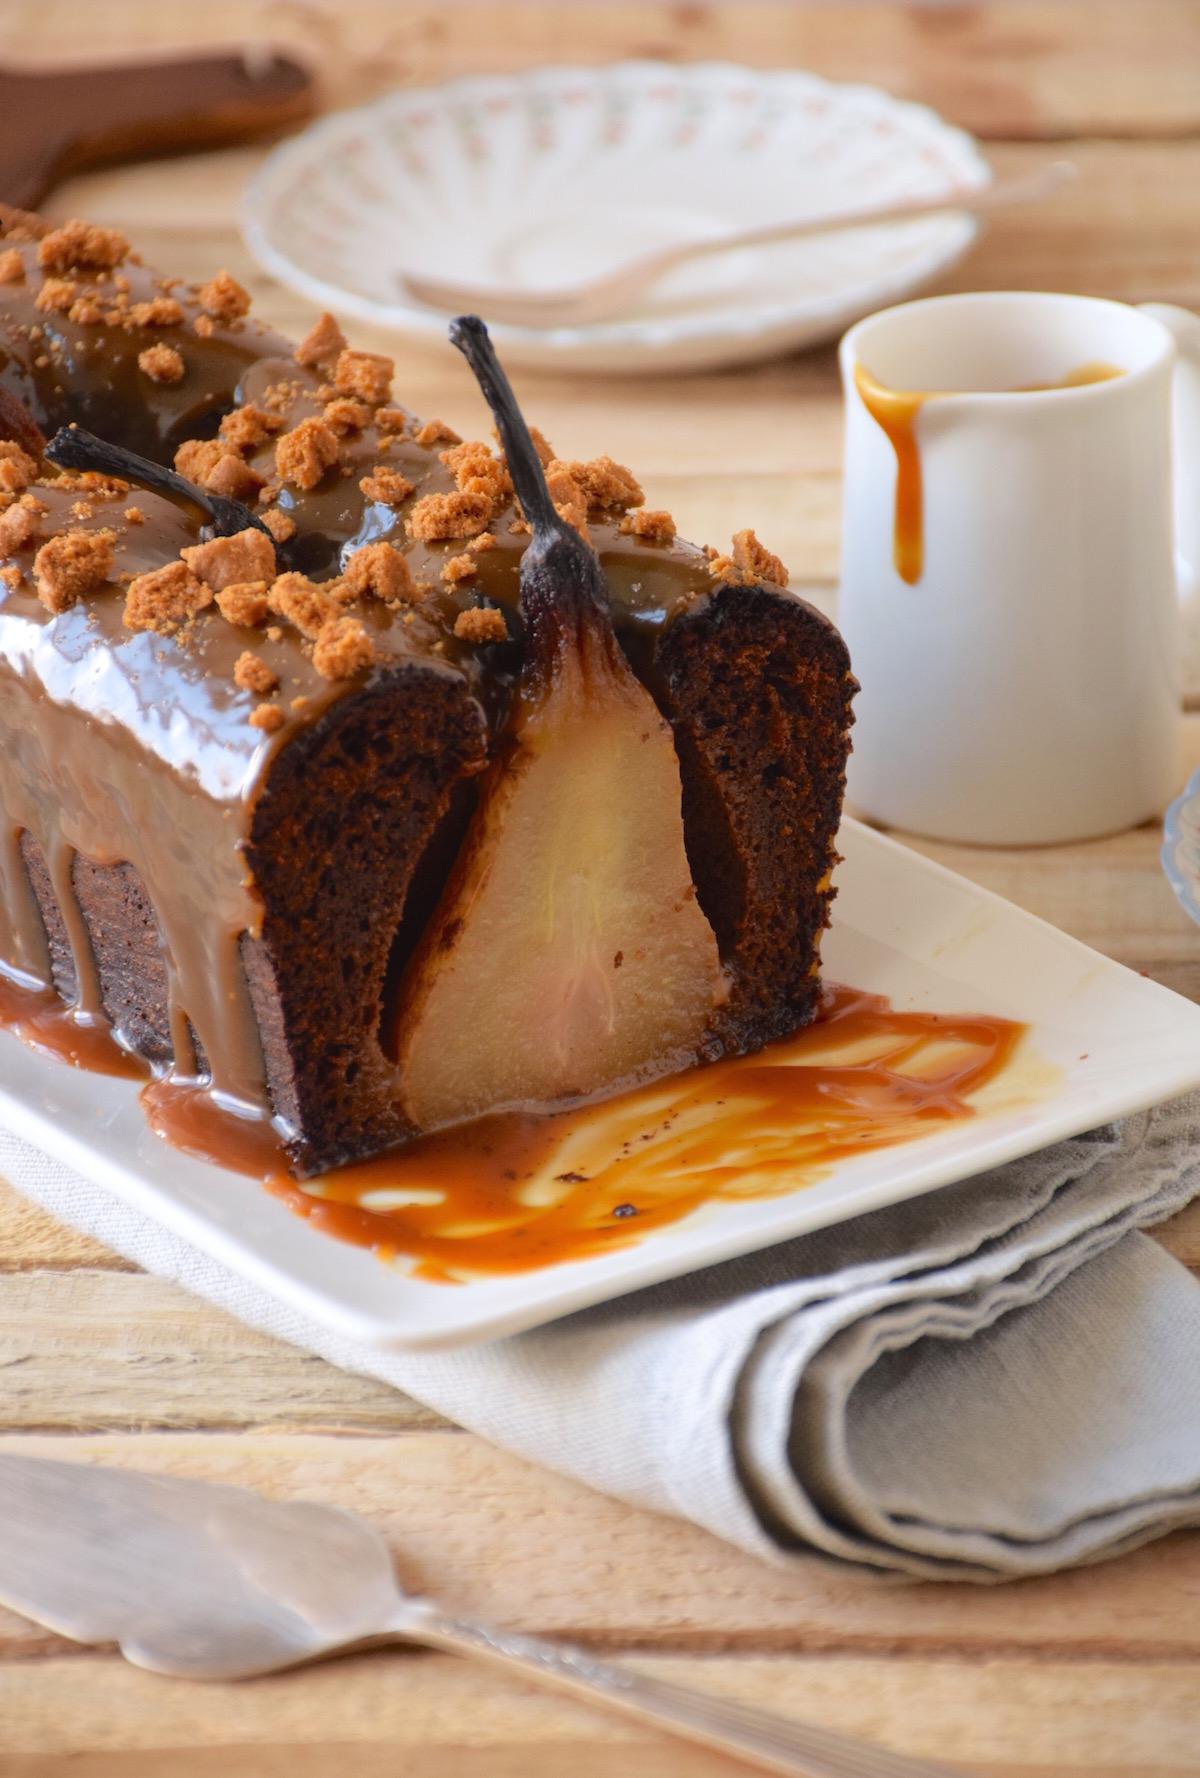 Cake chocolat poires entières